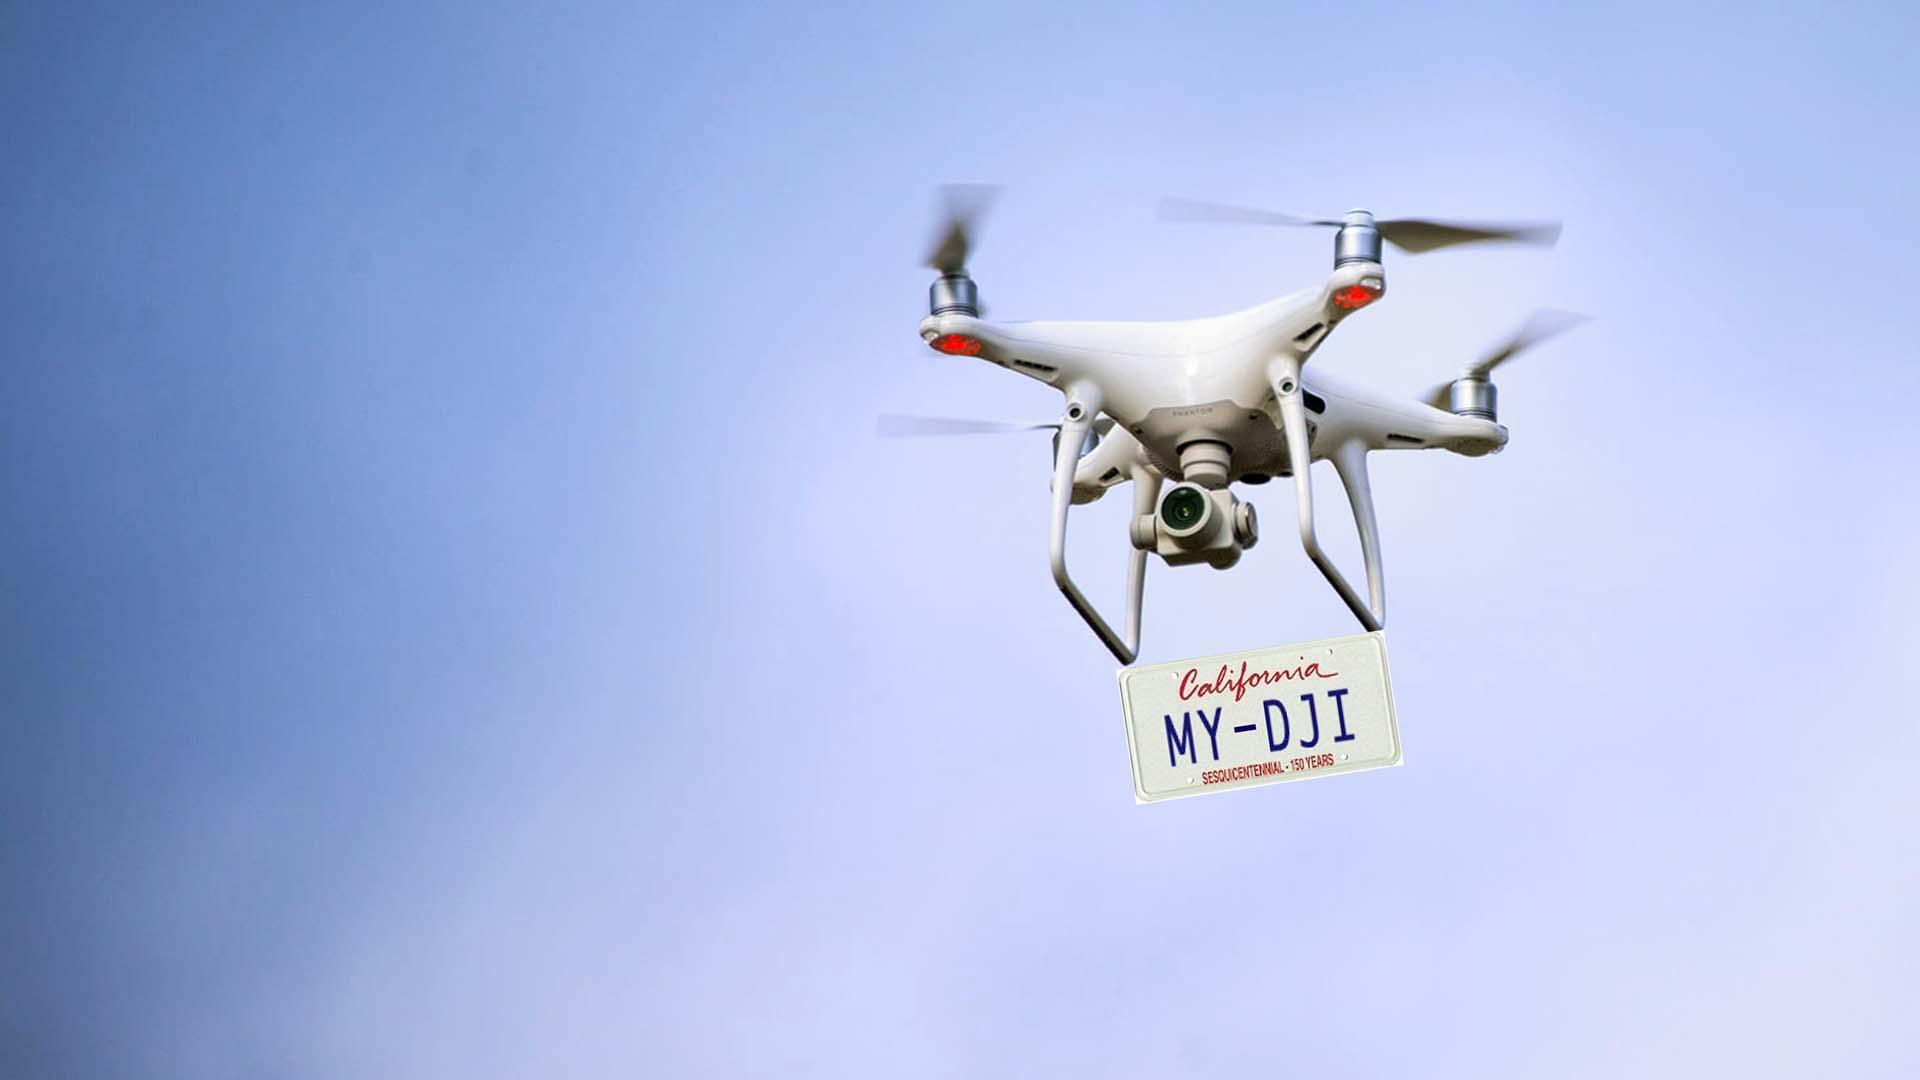 FAAの新規制 - 全てのドローンが追跡対象に